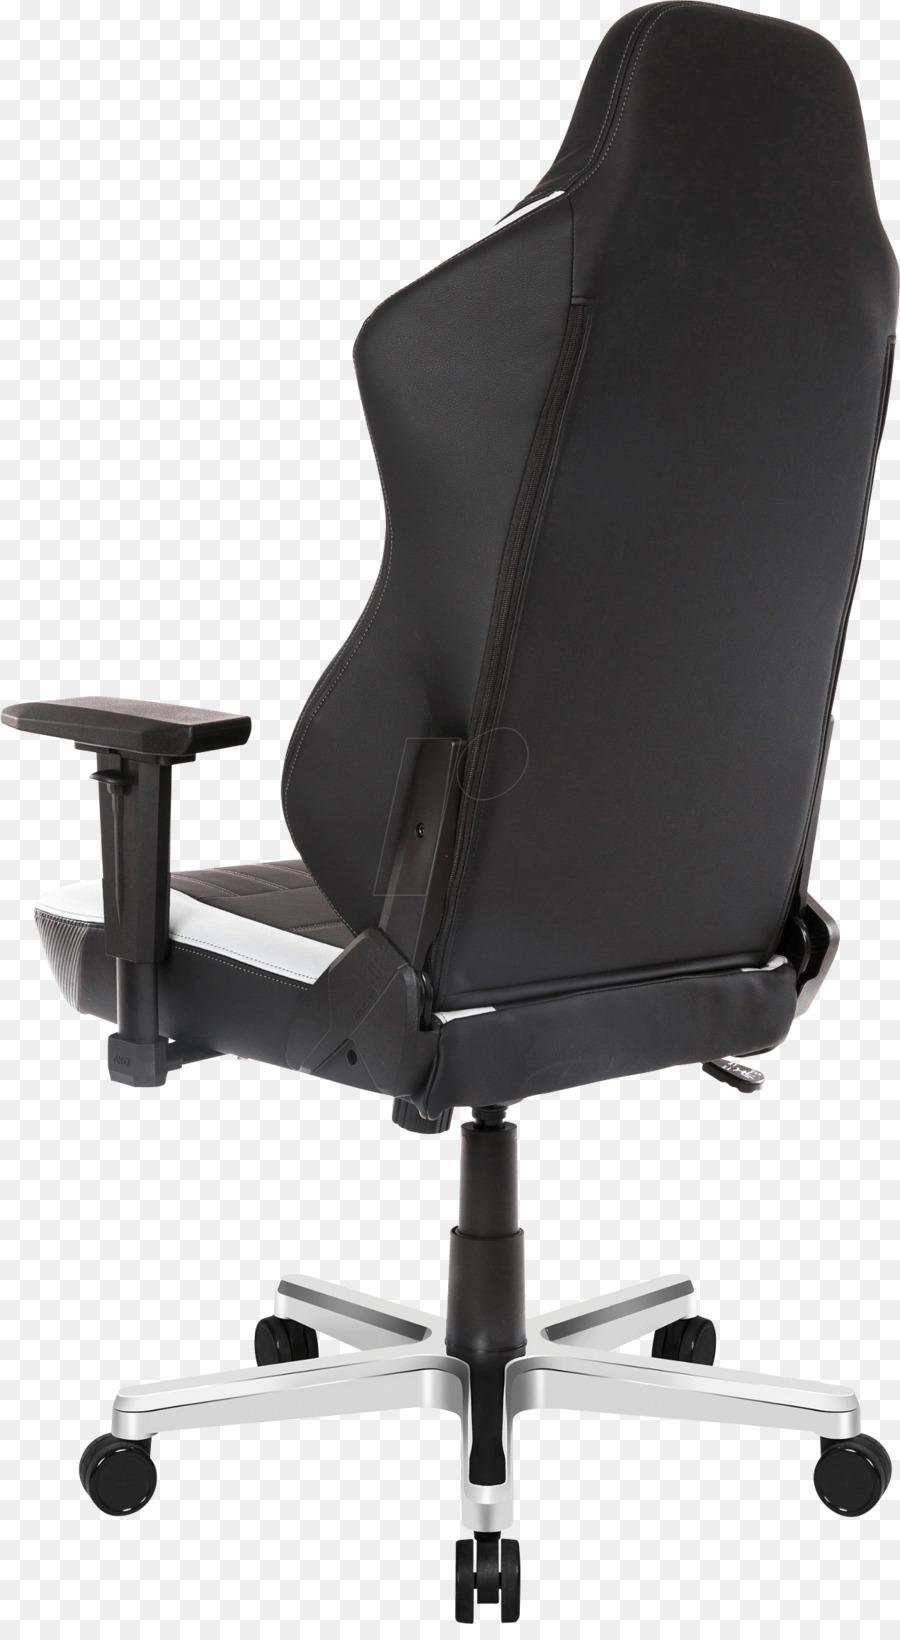 AKRACING Solitude Office u0026 Desk Chairs Gaming chair AKRACING Gaming chair Table - chair & AKRACING Solitude Office u0026 Desk Chairs Gaming chair AKRACING Gaming ...